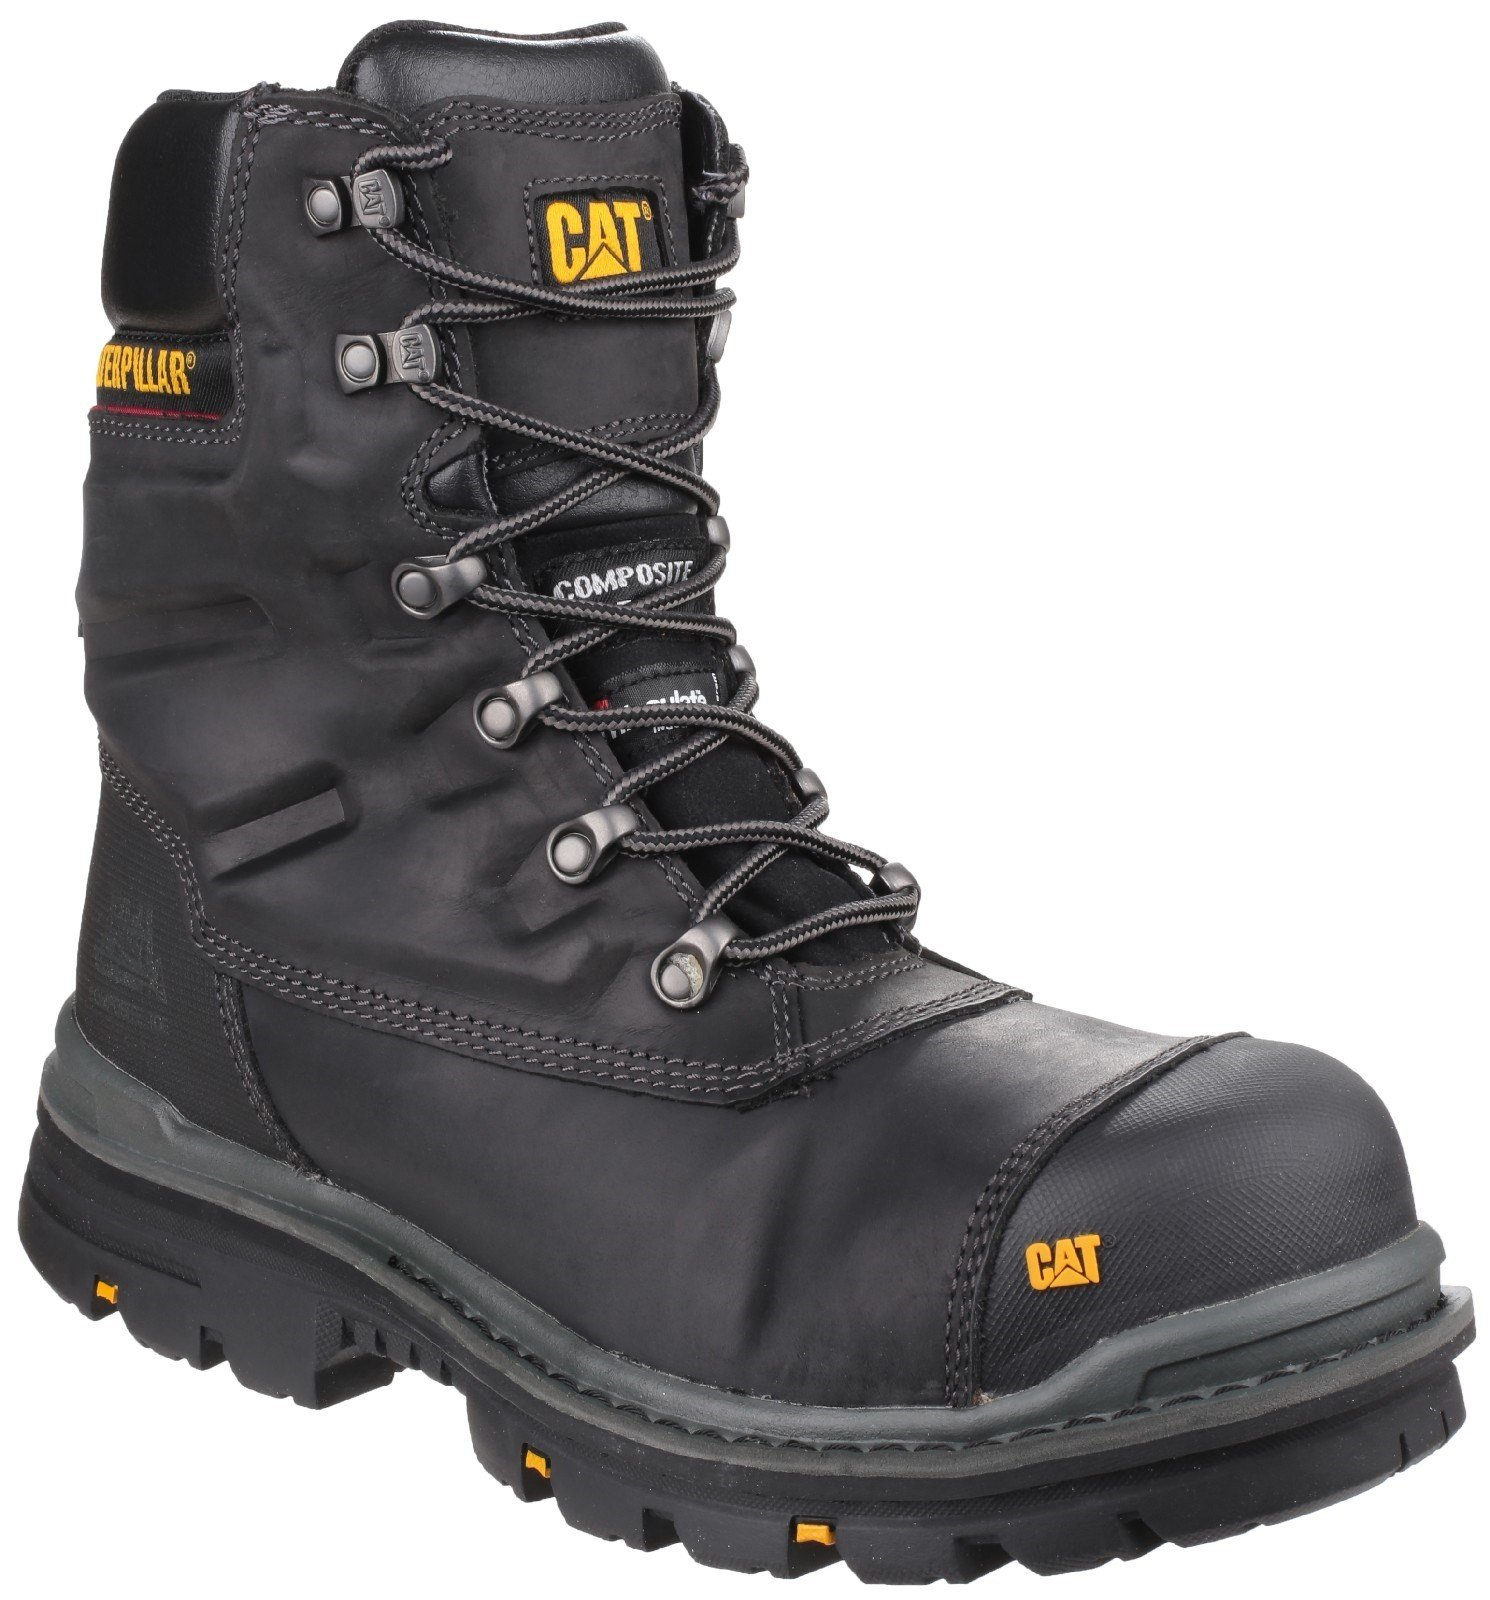 Caterpillar Men's Premier Waterproof Safety Boot Black 24527 - Black 6